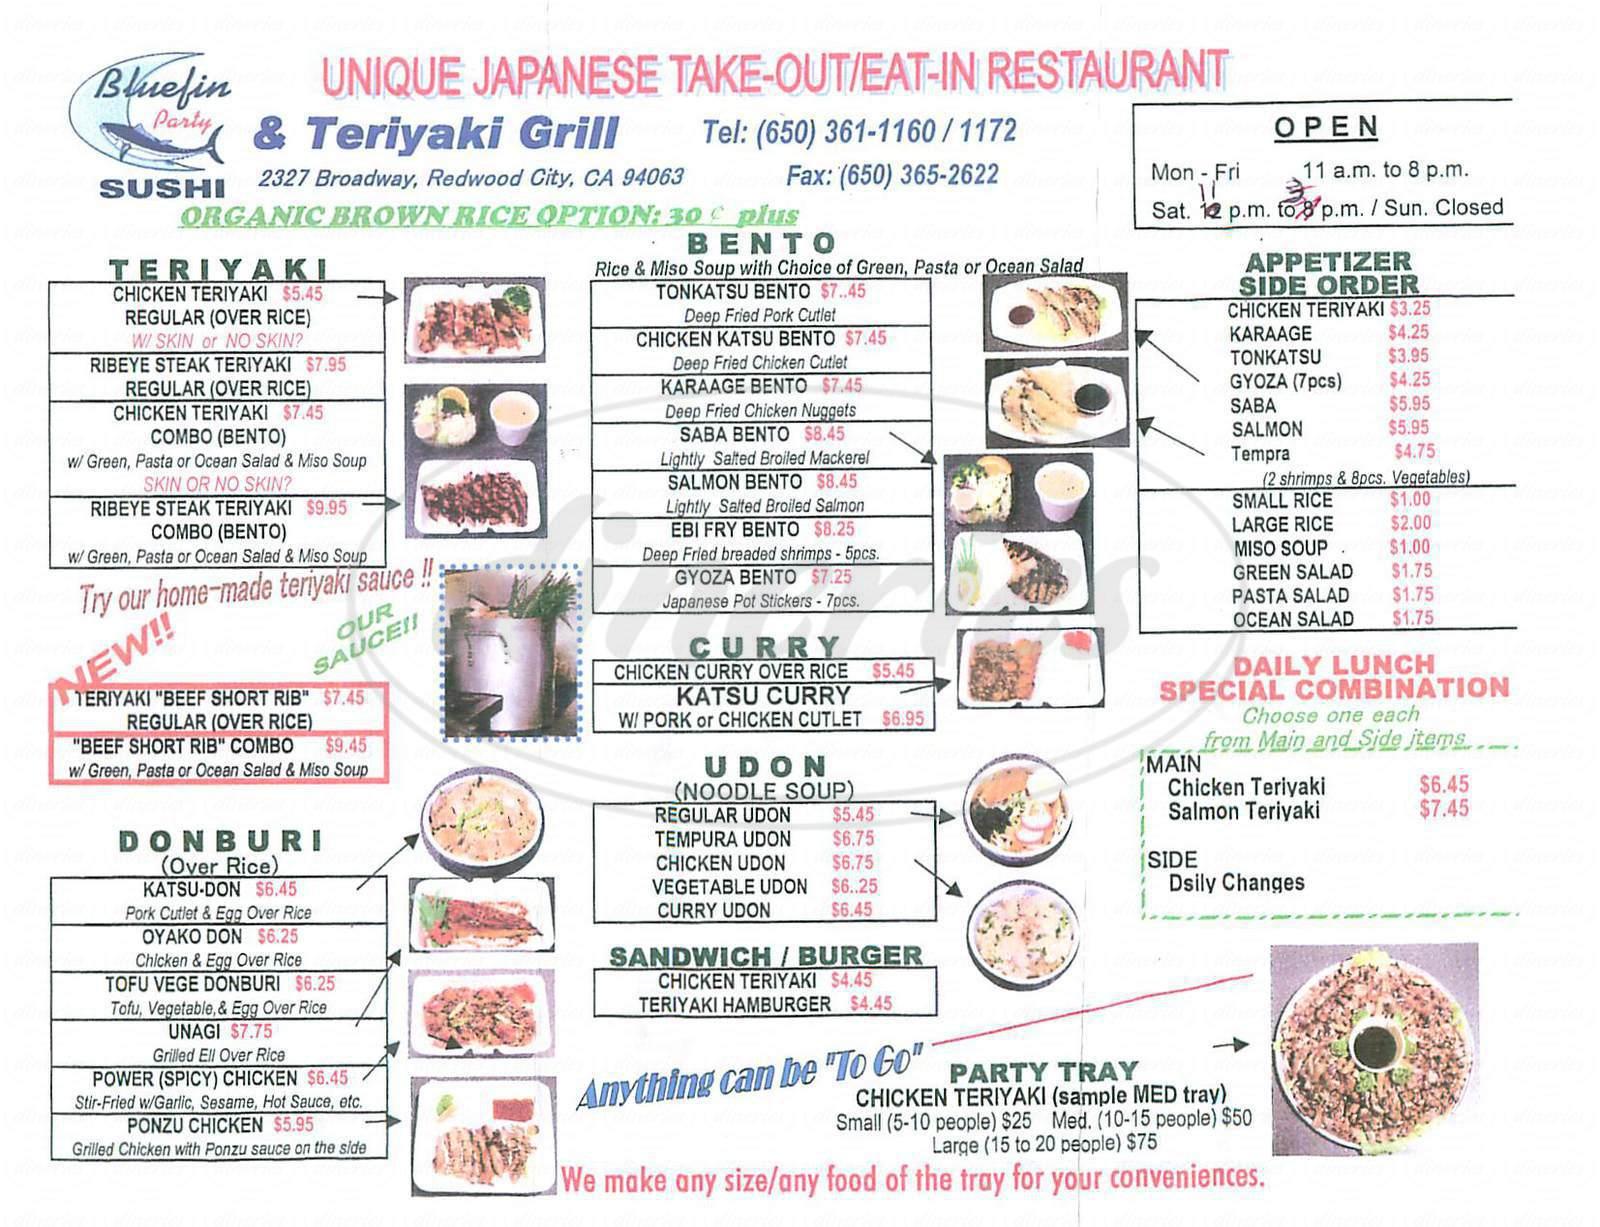 menu for Bluefin Sush & Teriyaki Grill